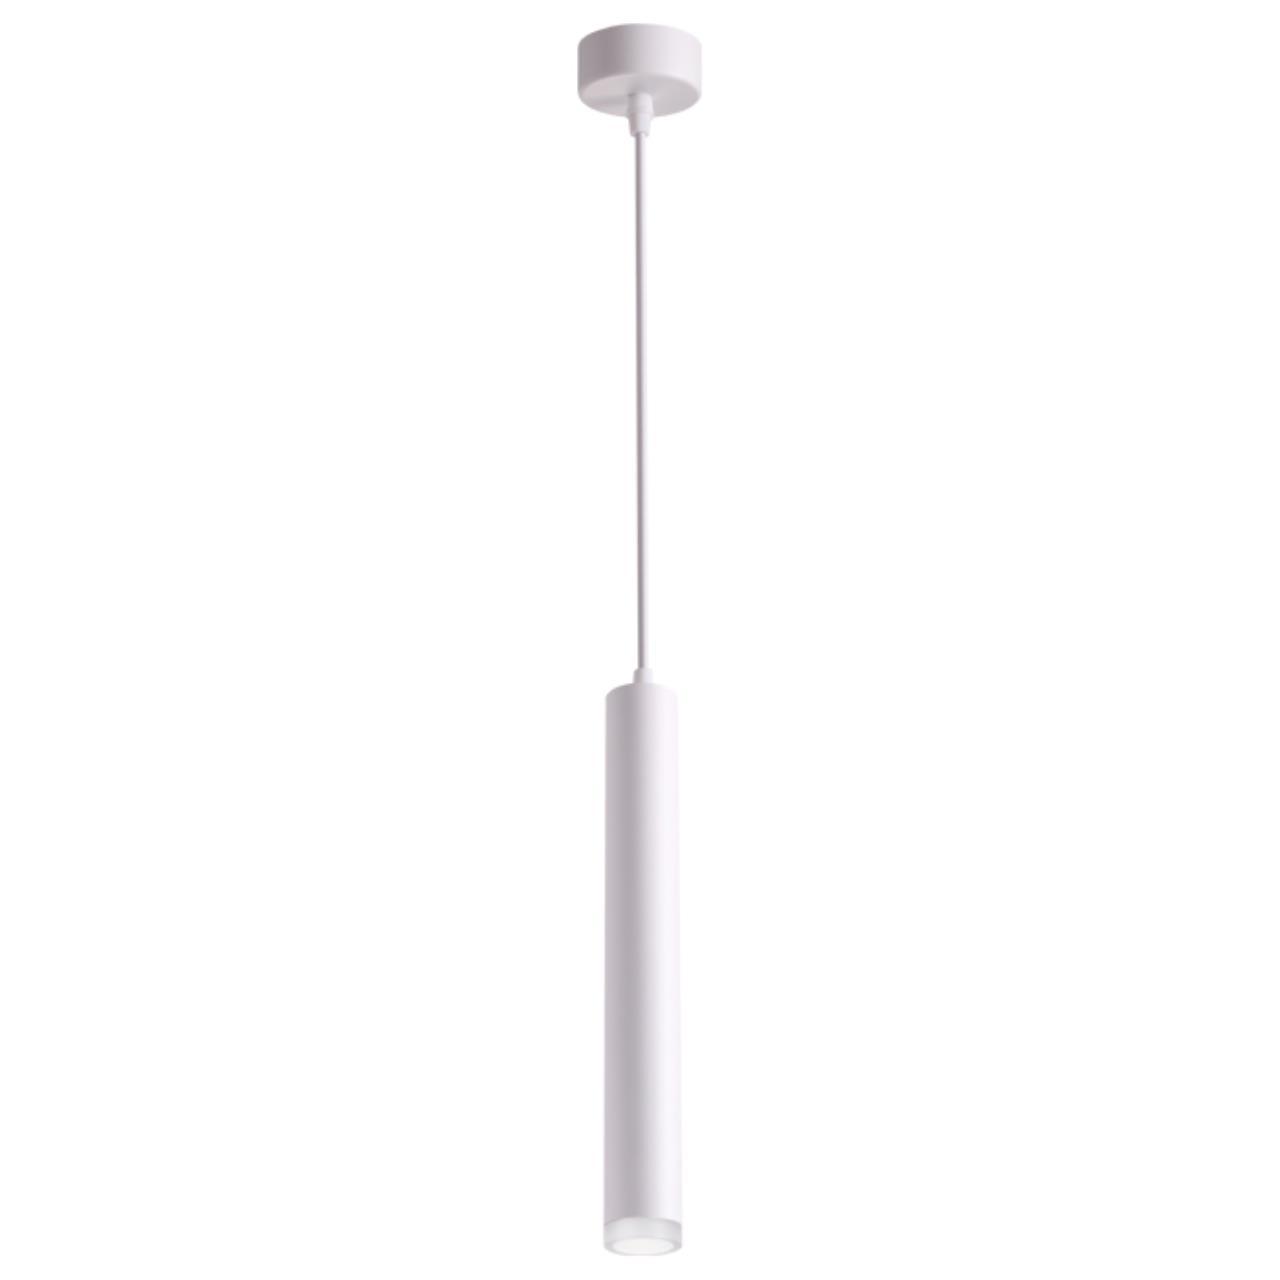 358129 OVER NT19 069 белый Накладной светильник, длина провода 1м IP20 LED 3000K 10W 160 - 265V MODO